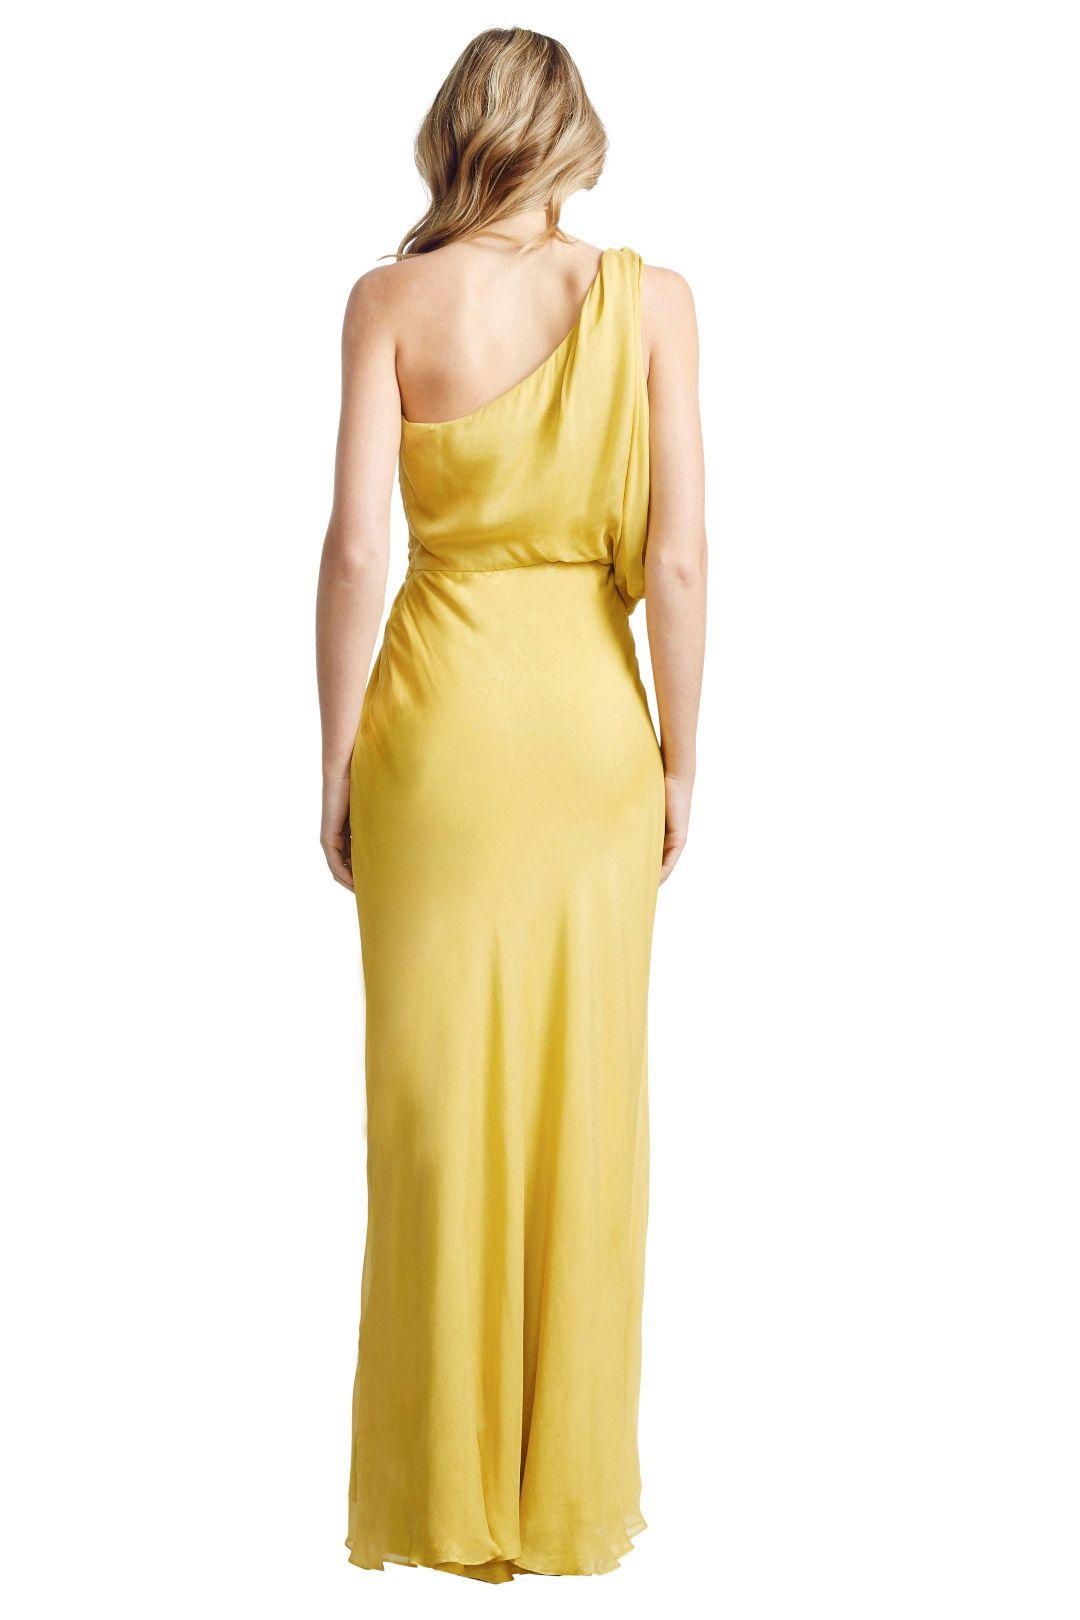 Aurelio Costarella - Athene Gown - Yellow - Back